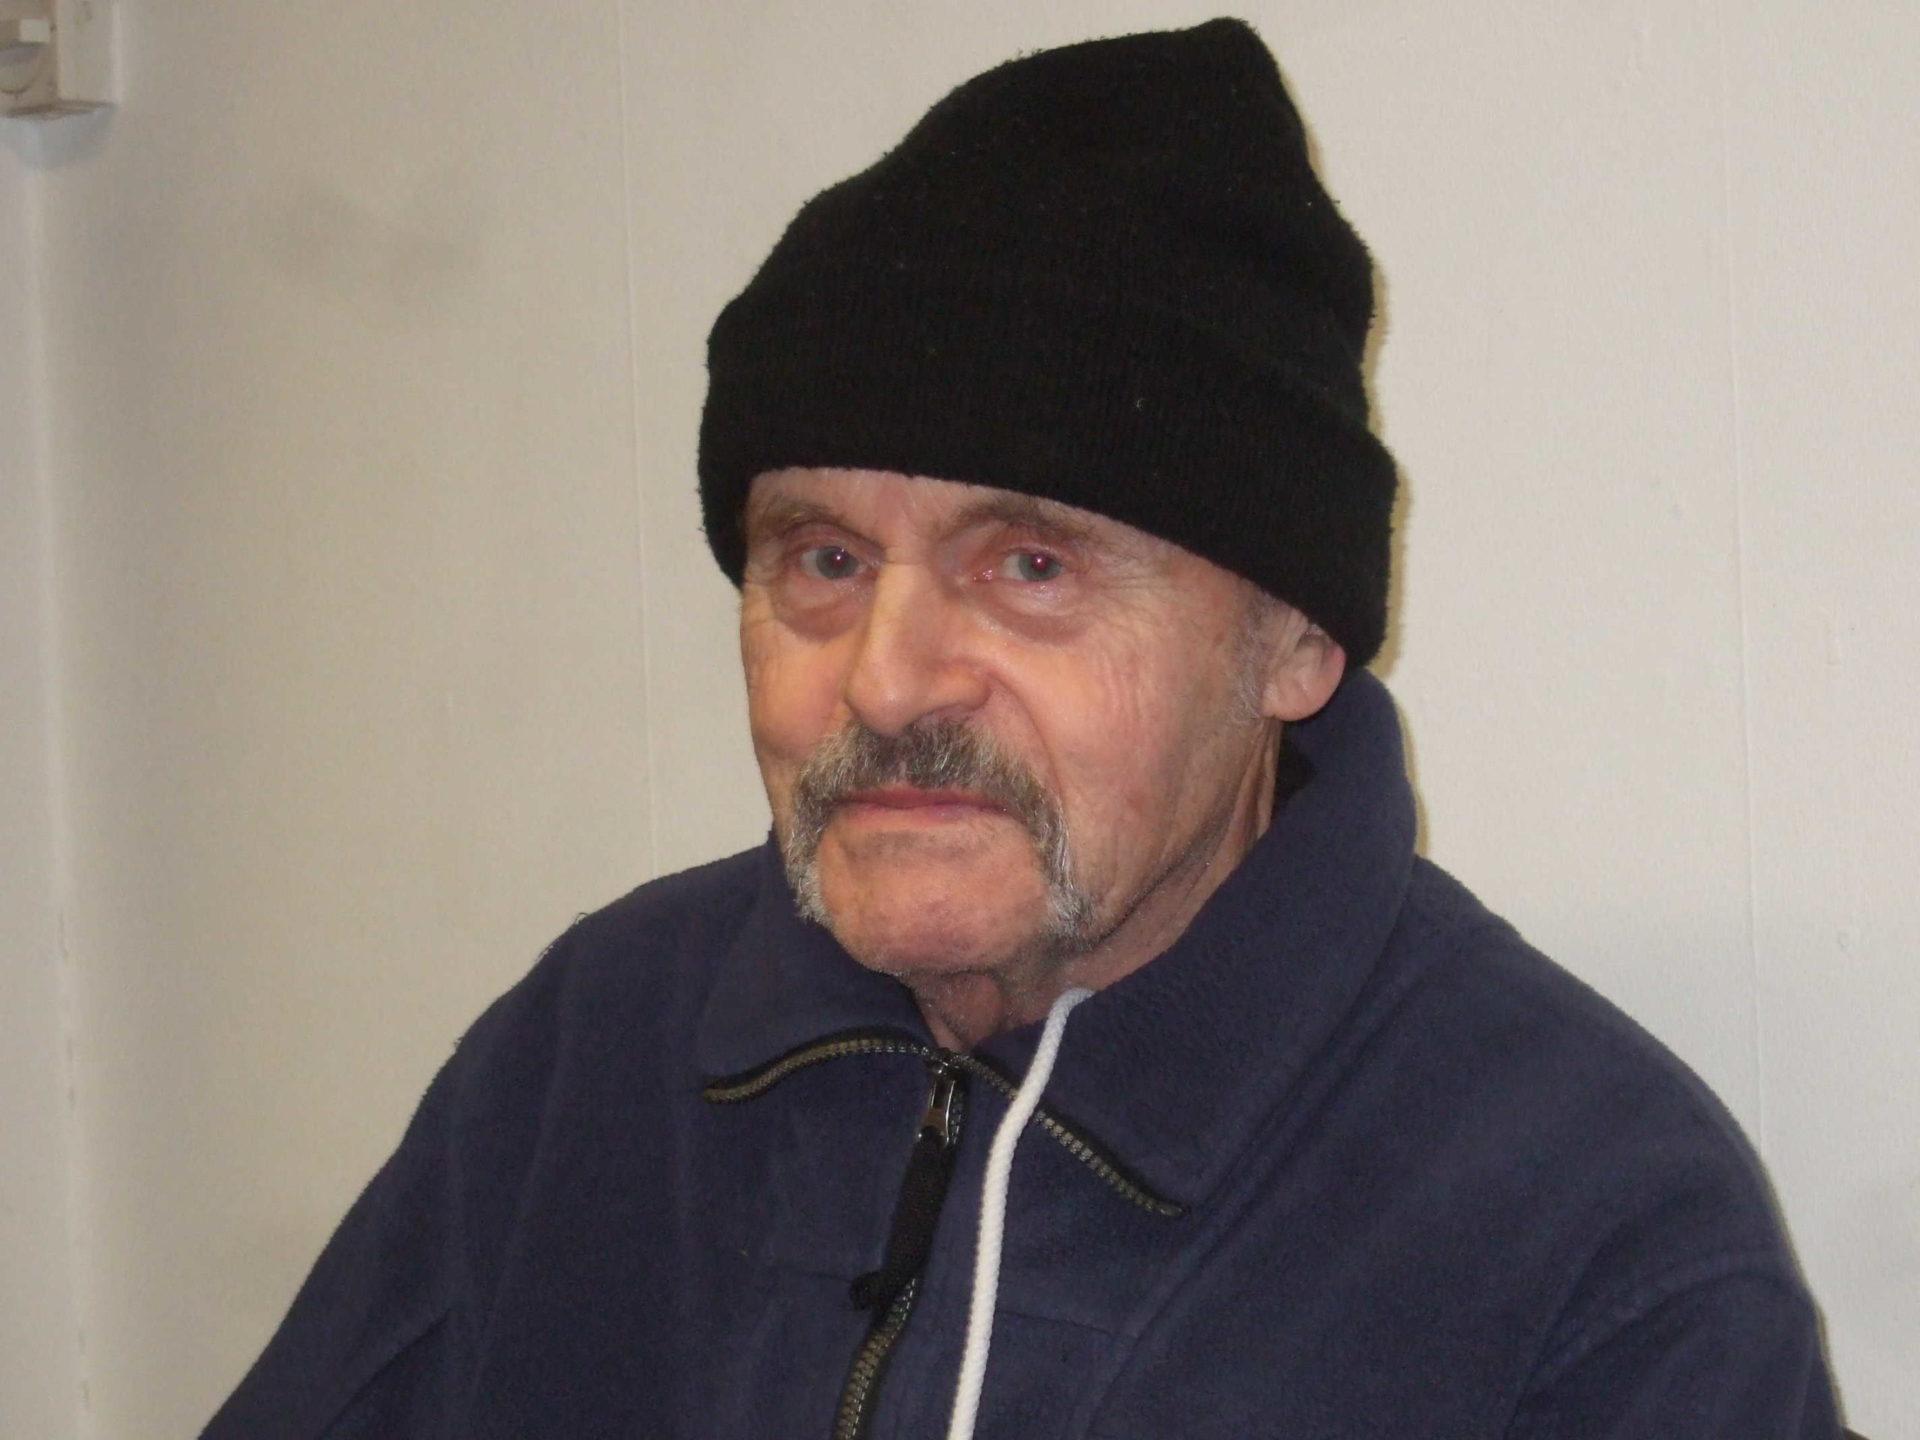 Sven-Olaf Nordli